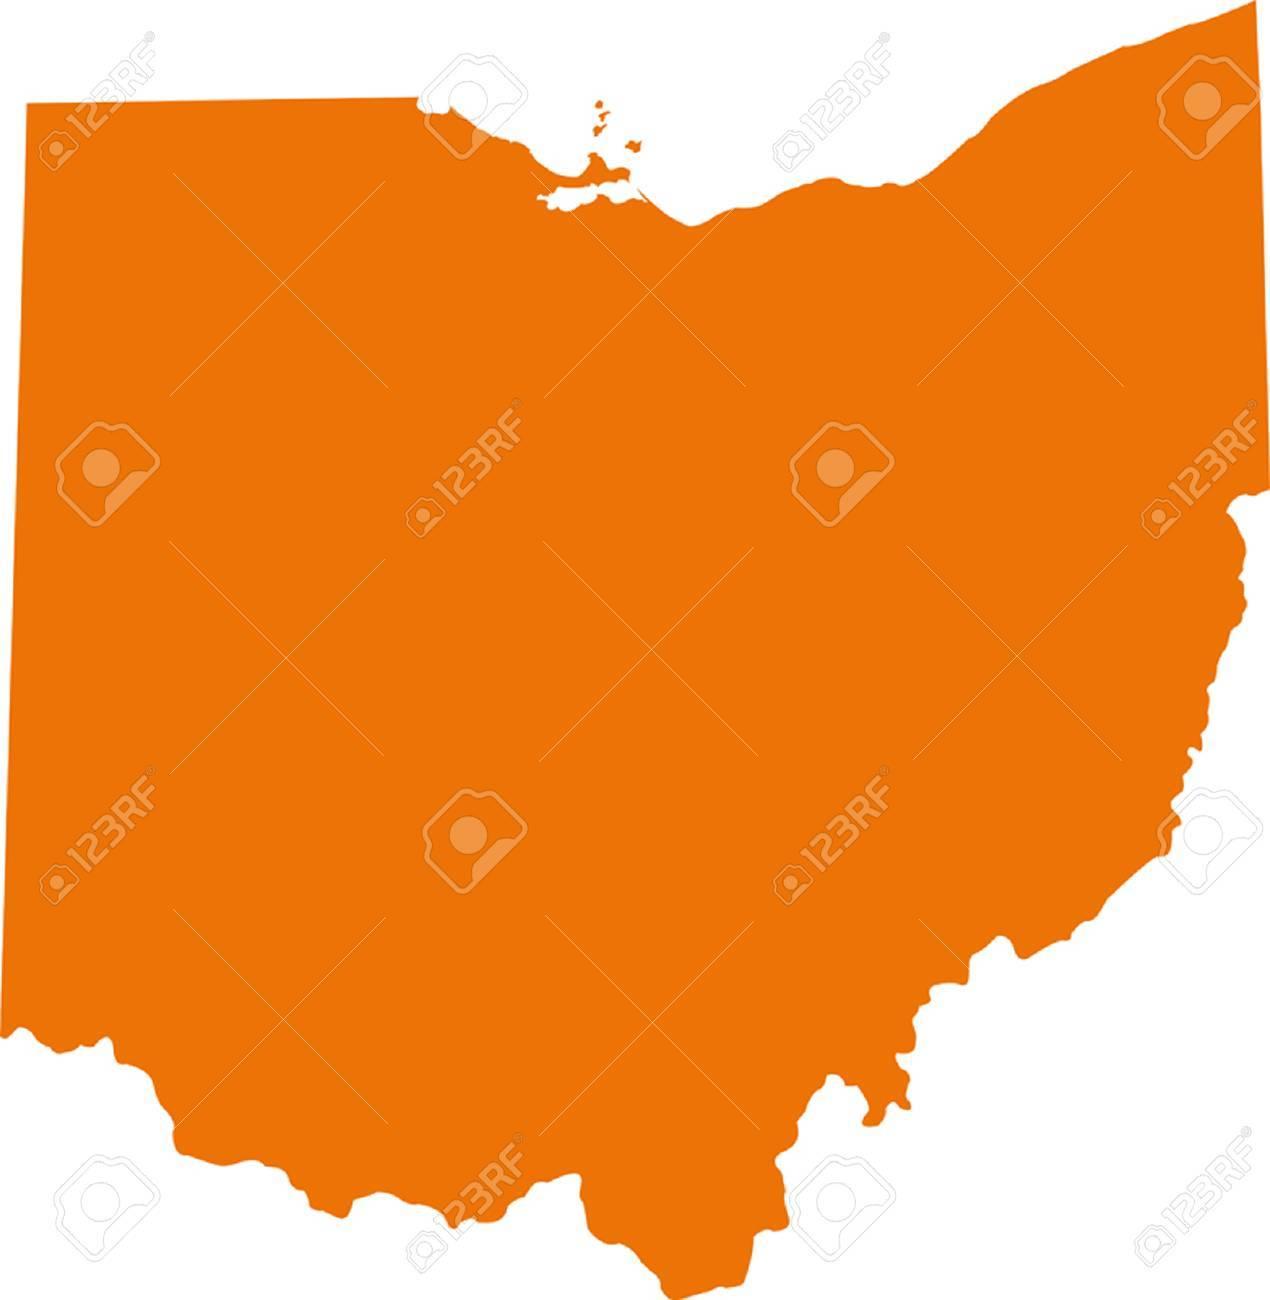 Free Ohio Map.Ohio Map